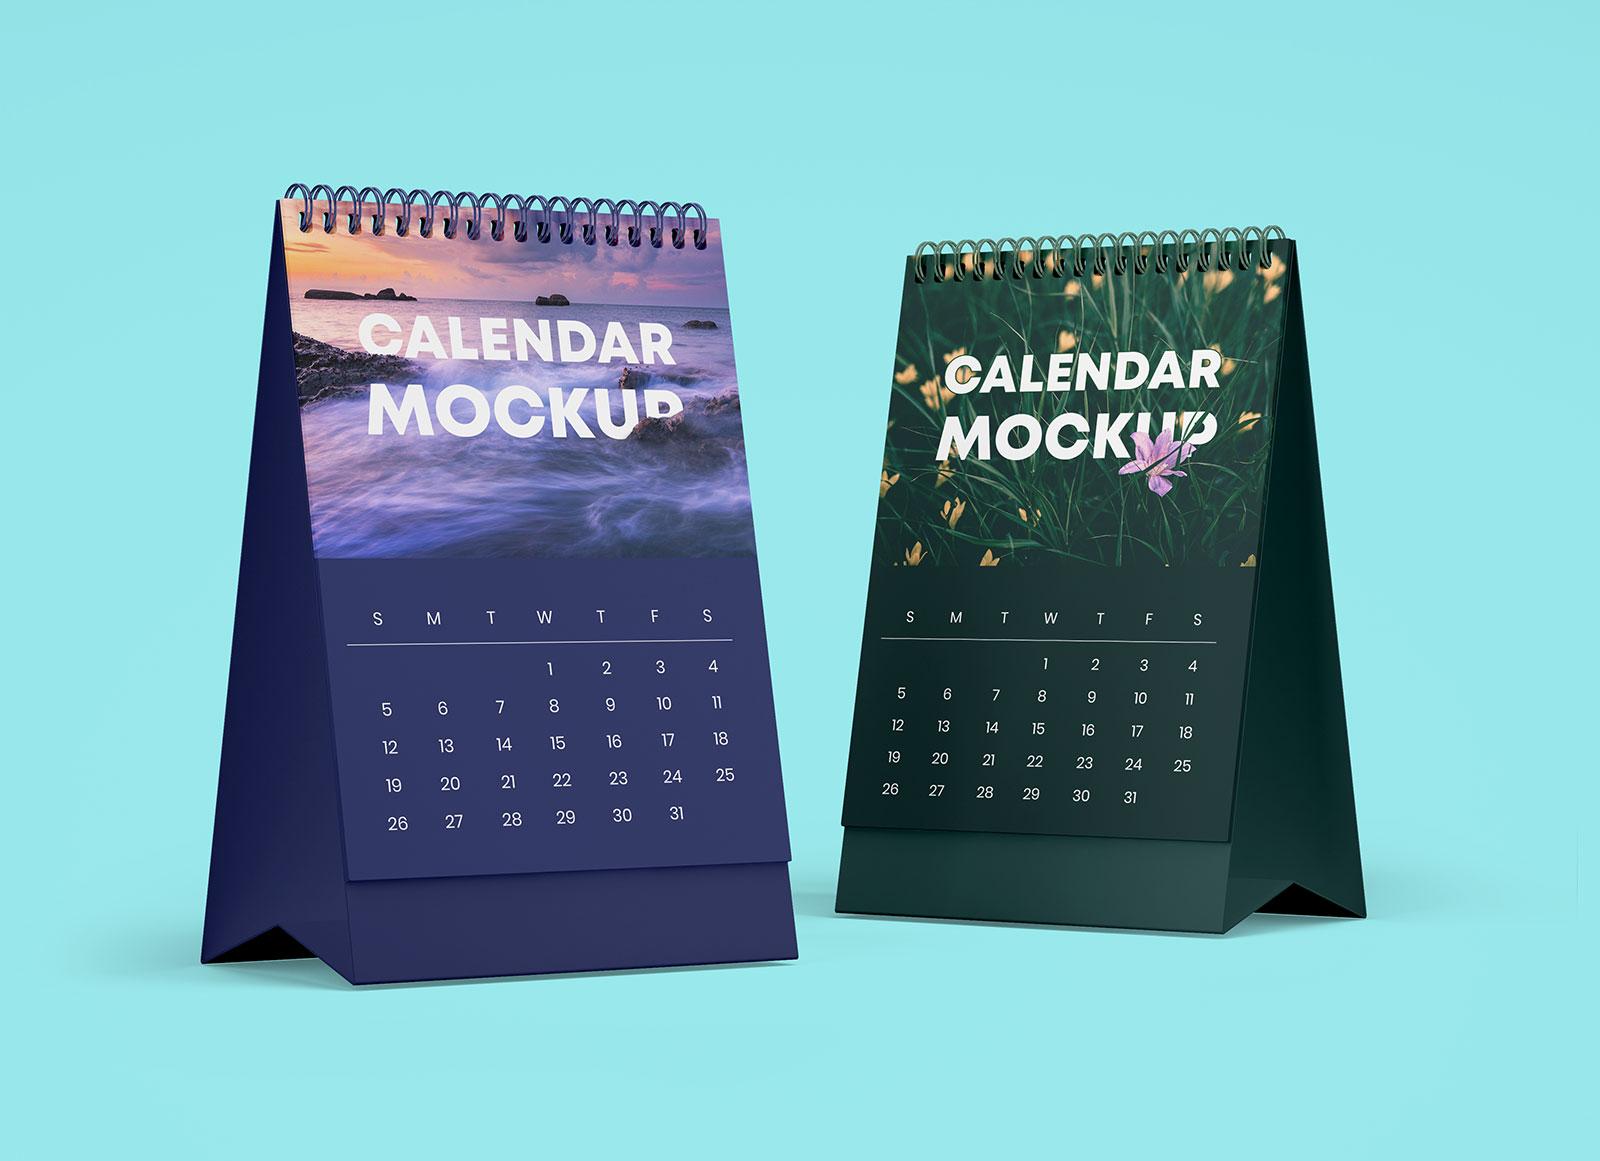 Free-Table-Office-Desk-Tent-Calendar-Mockup-PSD-Set-3